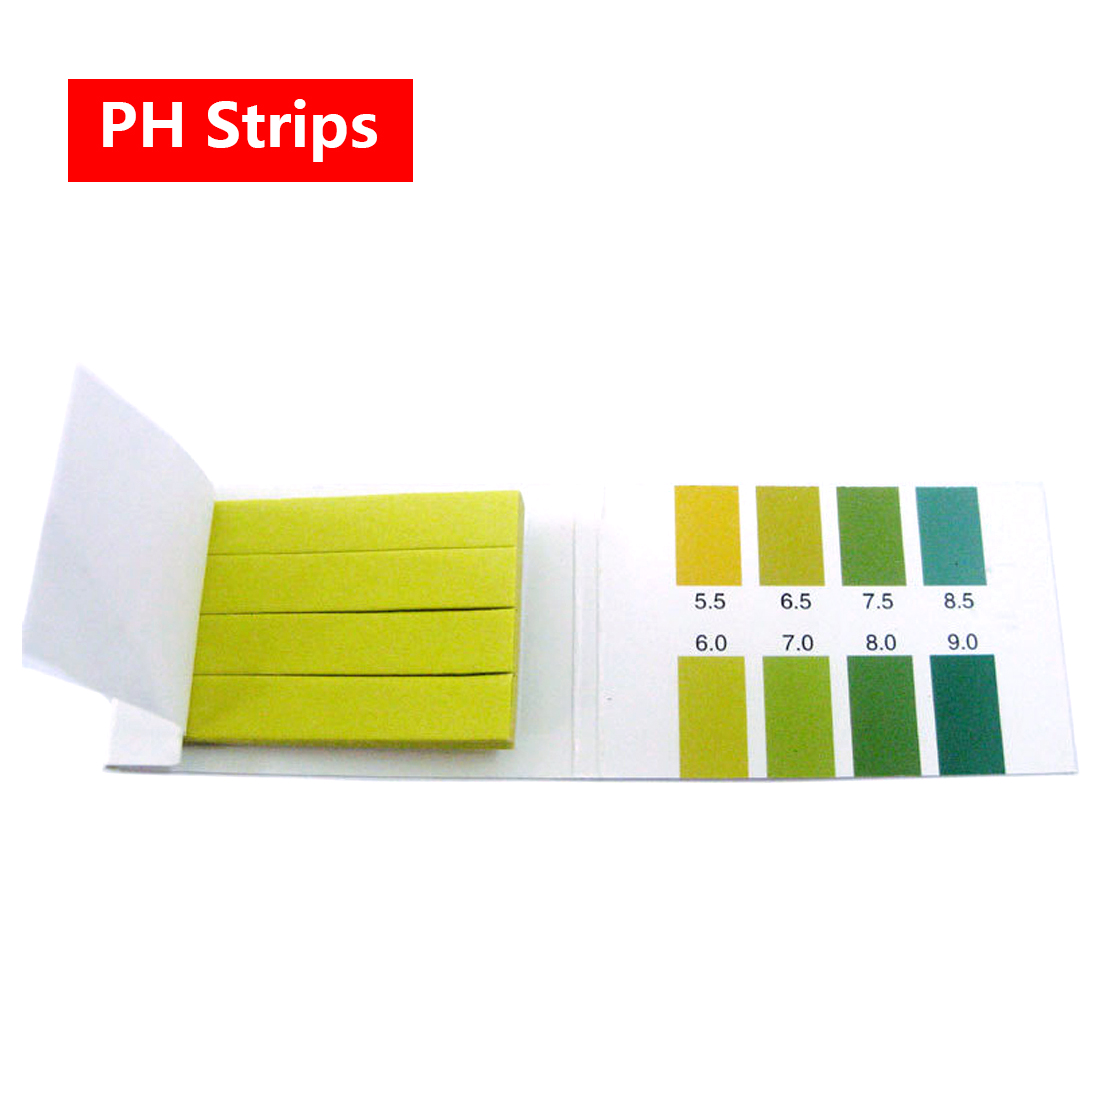 Precision PH Test Strips Short Range 5.5-9.0 Indicator Paper Tester 100 Strips B